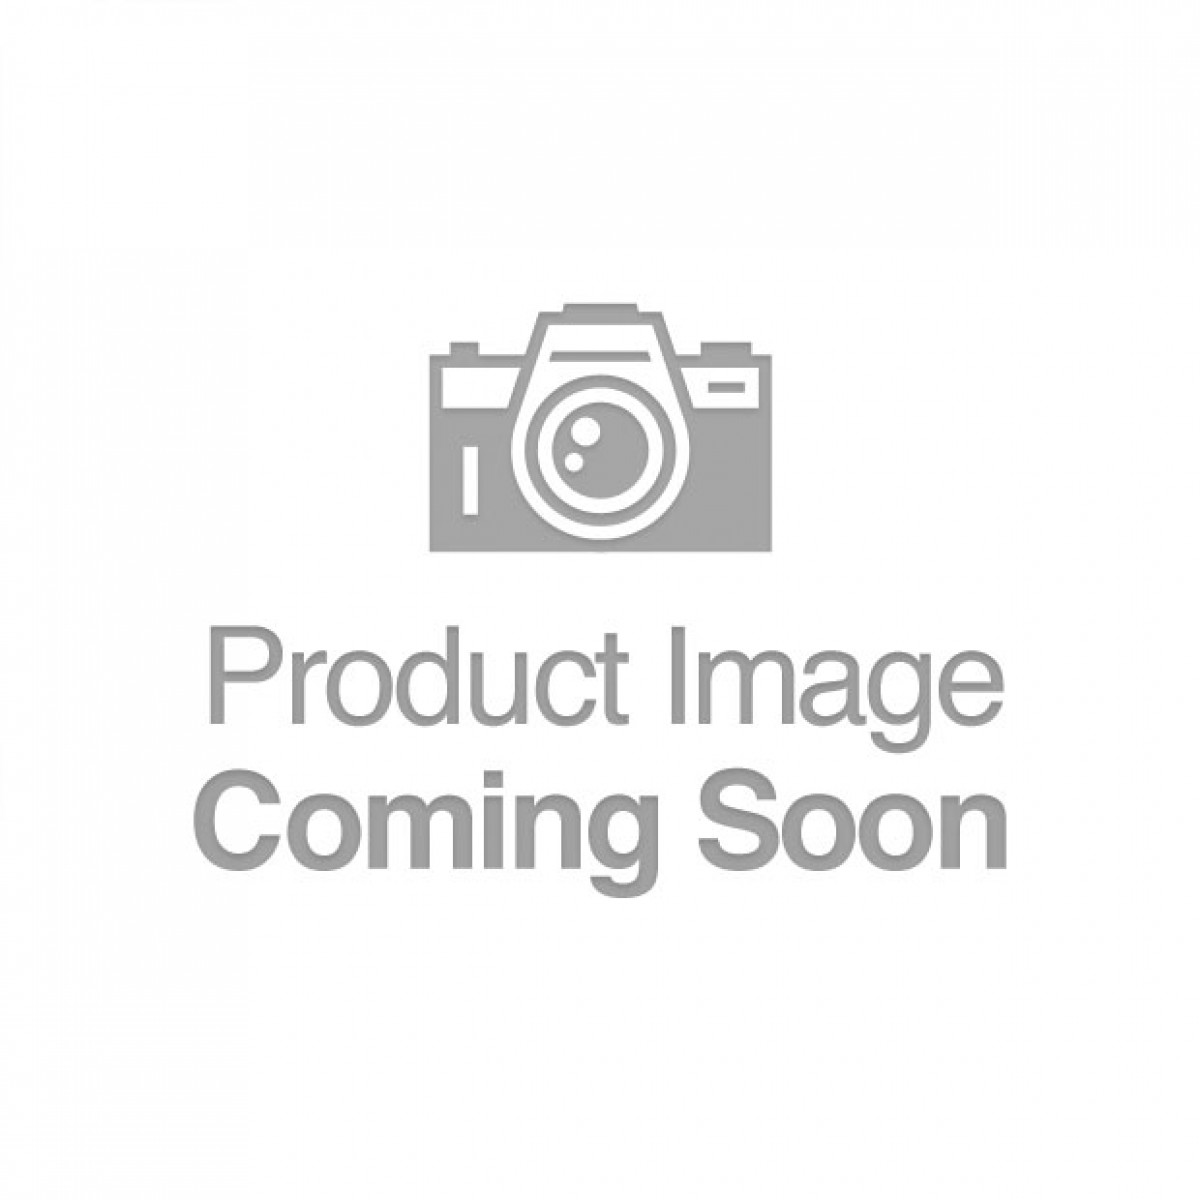 Wonder Vibes 7x Bendable Silicone Clit Stim Vibe  - Black